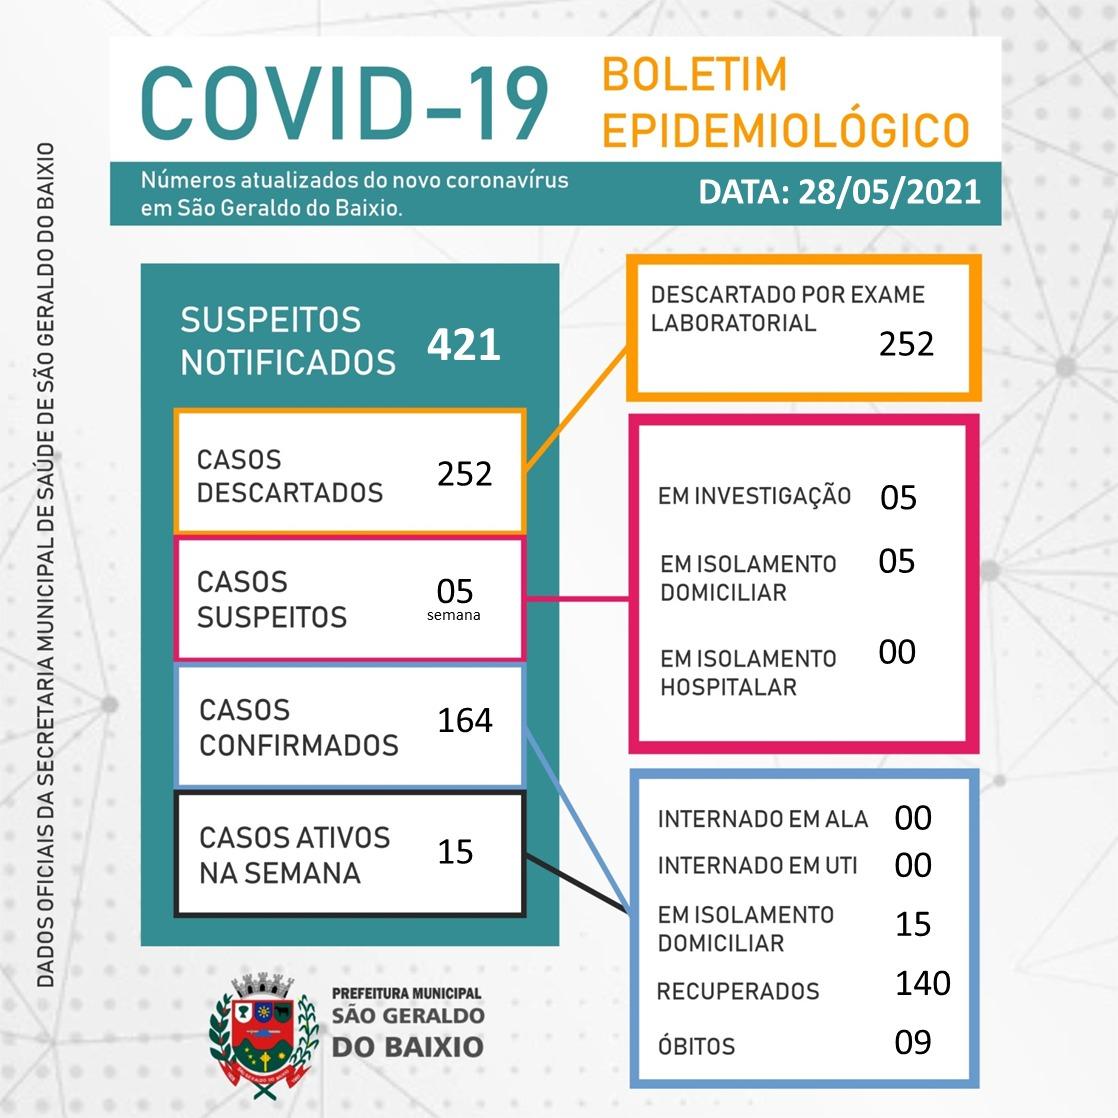 BOLETIM EPIDEMIOLÓGICO 28/05/2021